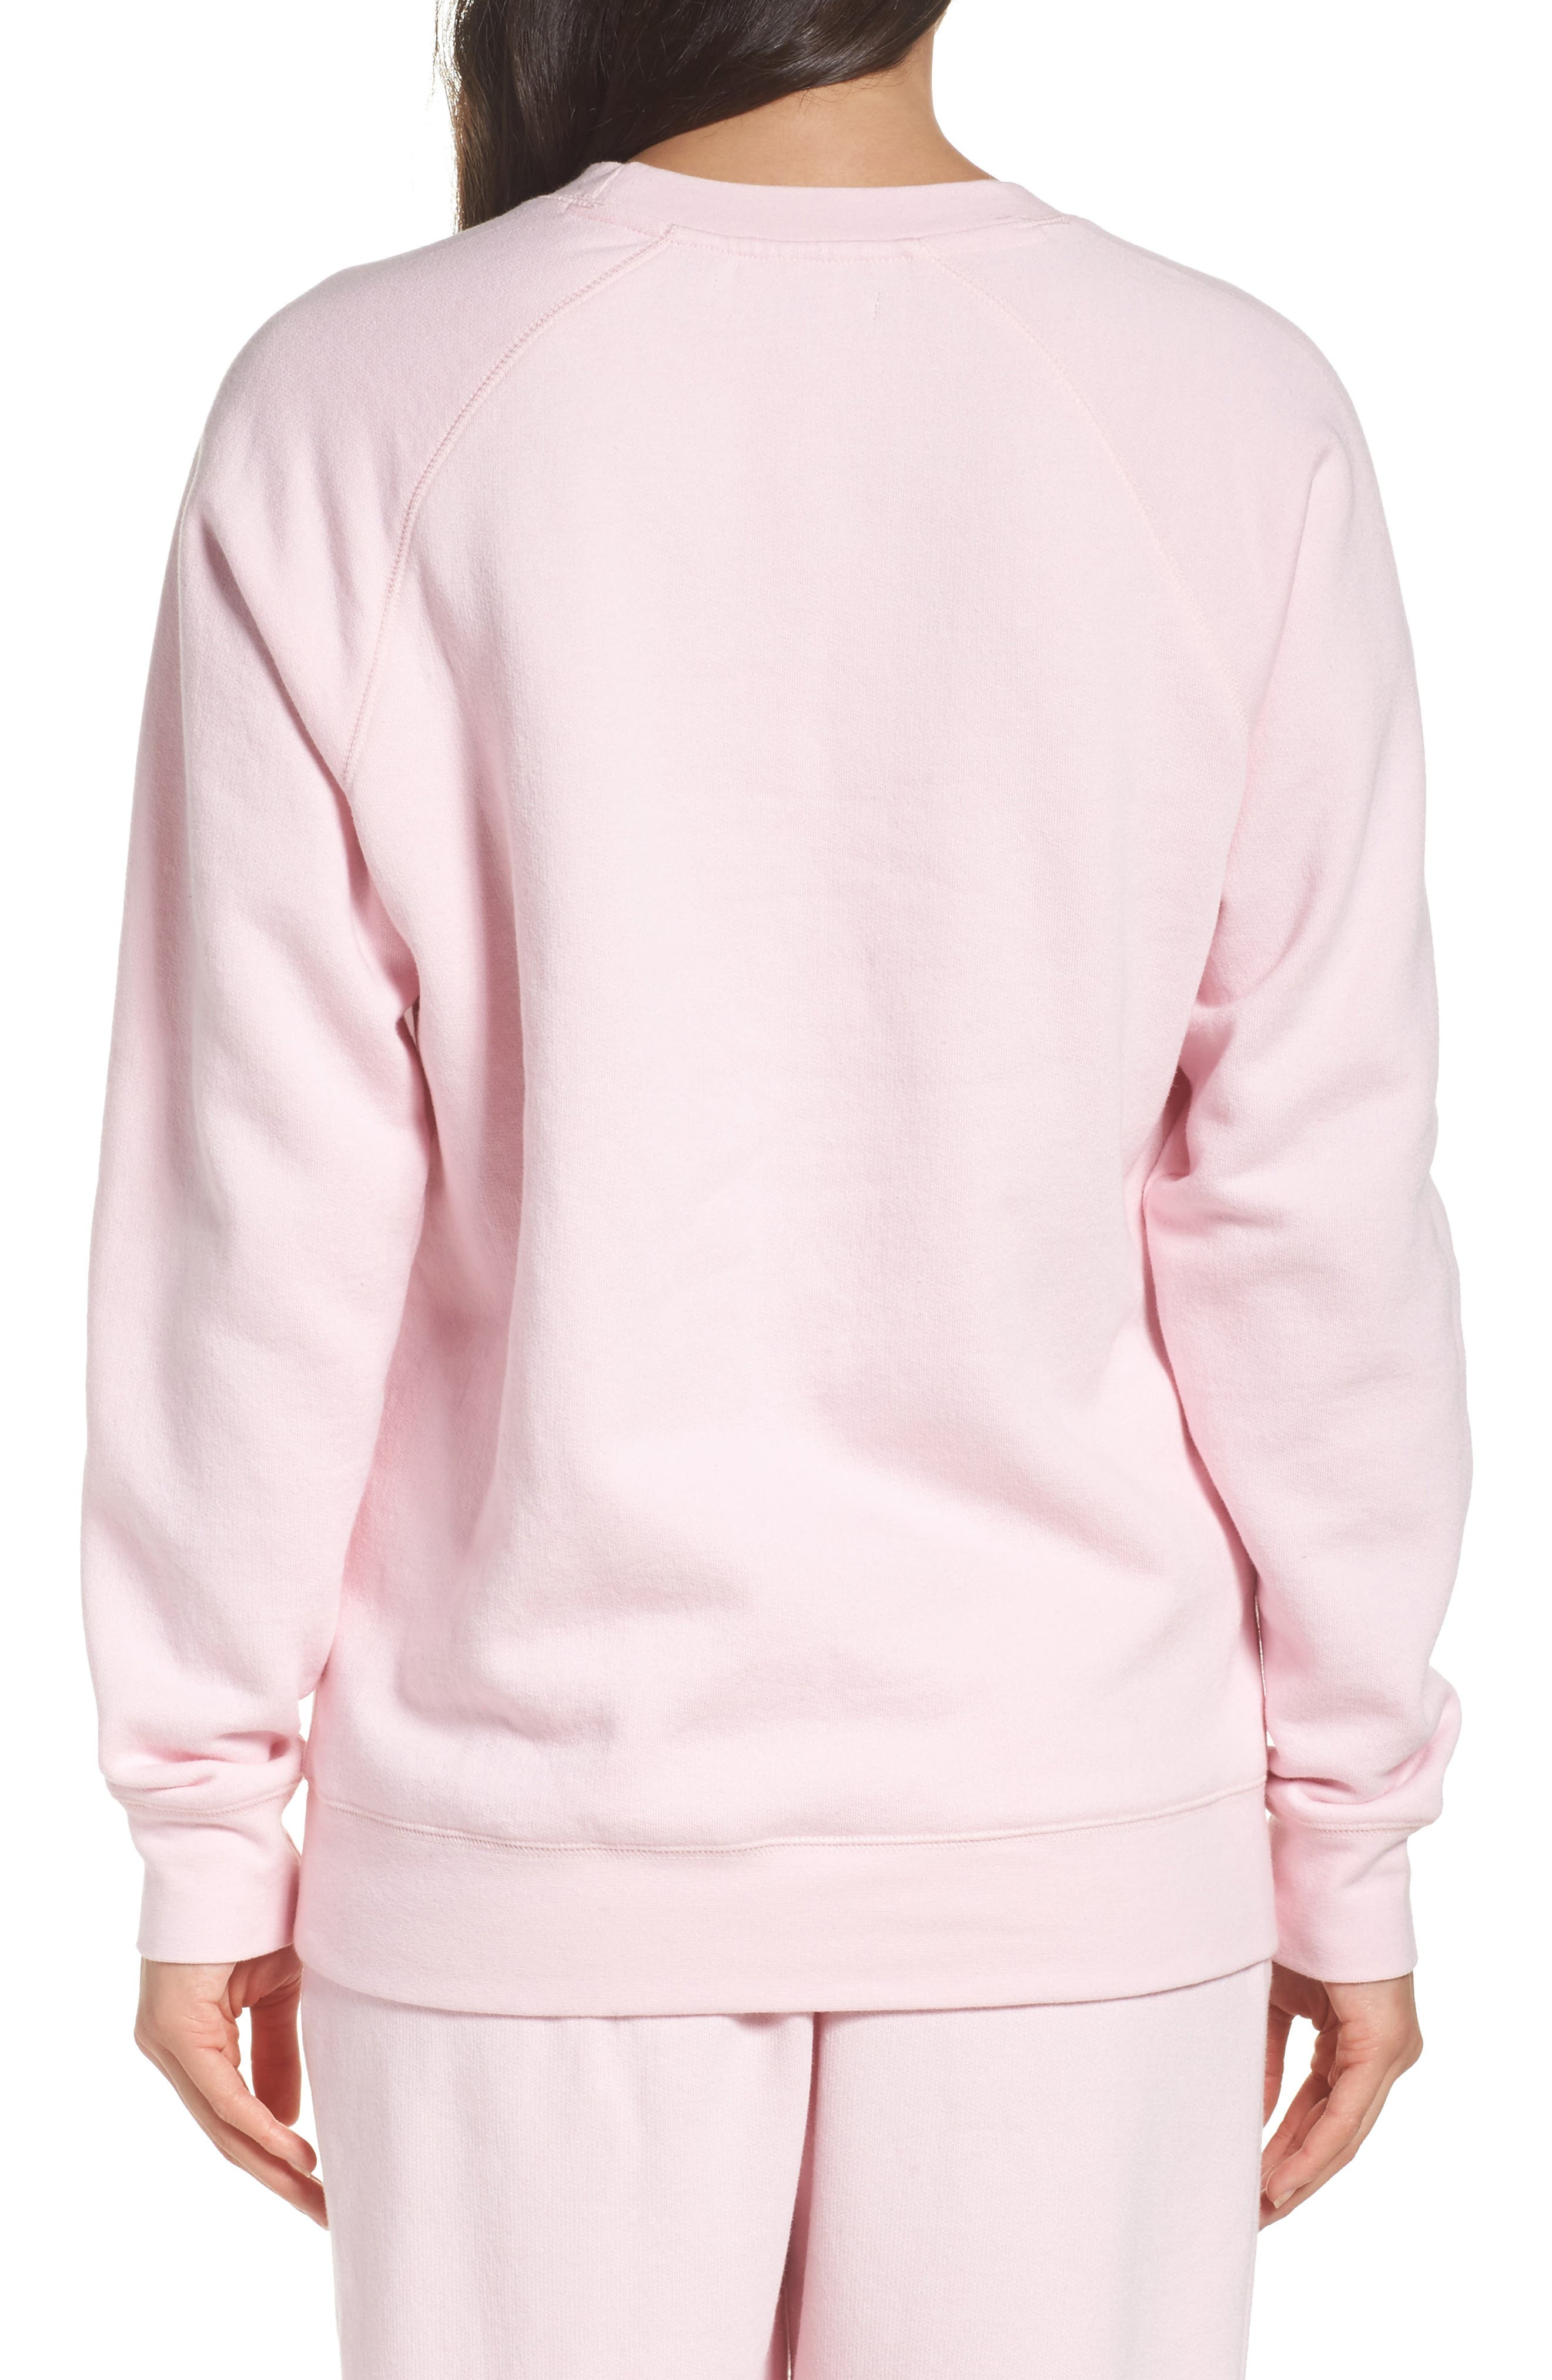 Brunette Crewneck Sweatshirt,                             Alternate thumbnail 2, color,                             Pink